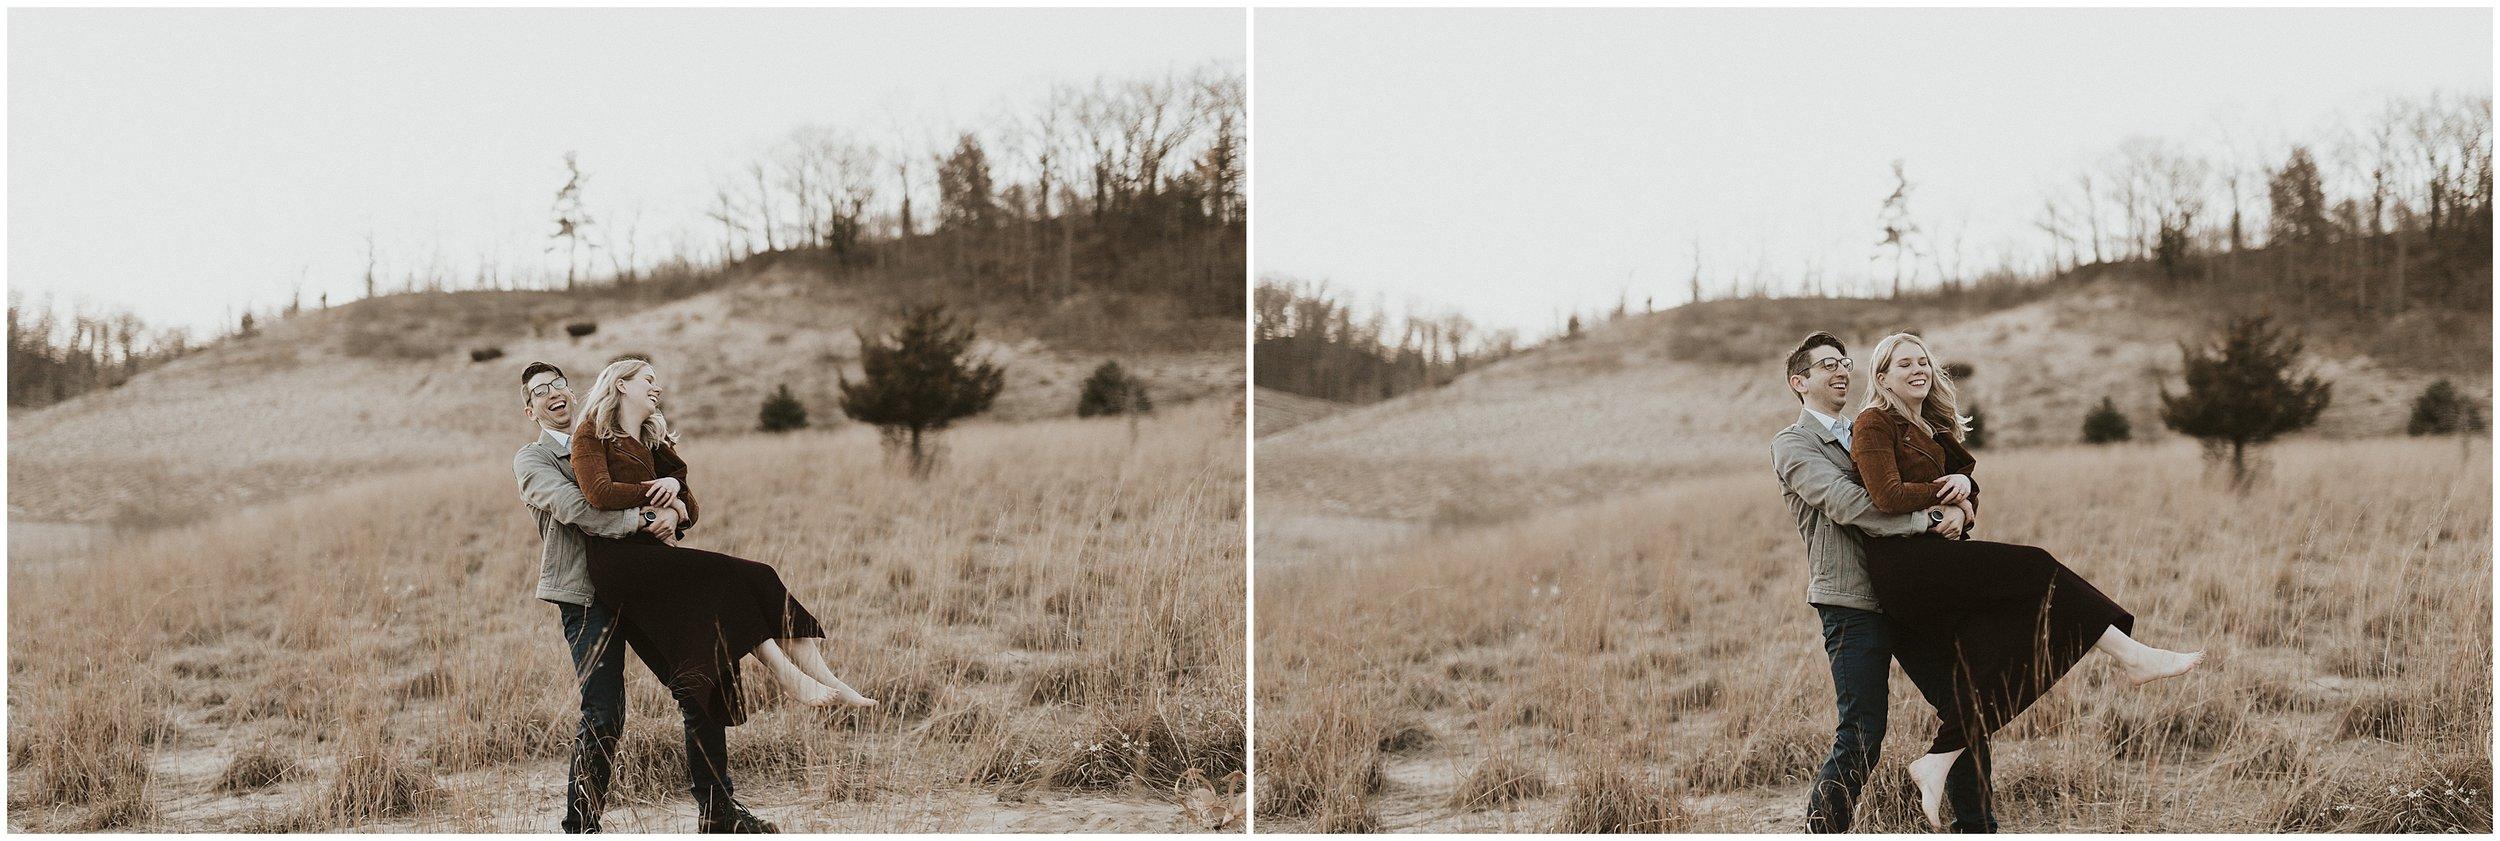 JAELYNNROSEPHOTOGRAPHY-9740.jpg